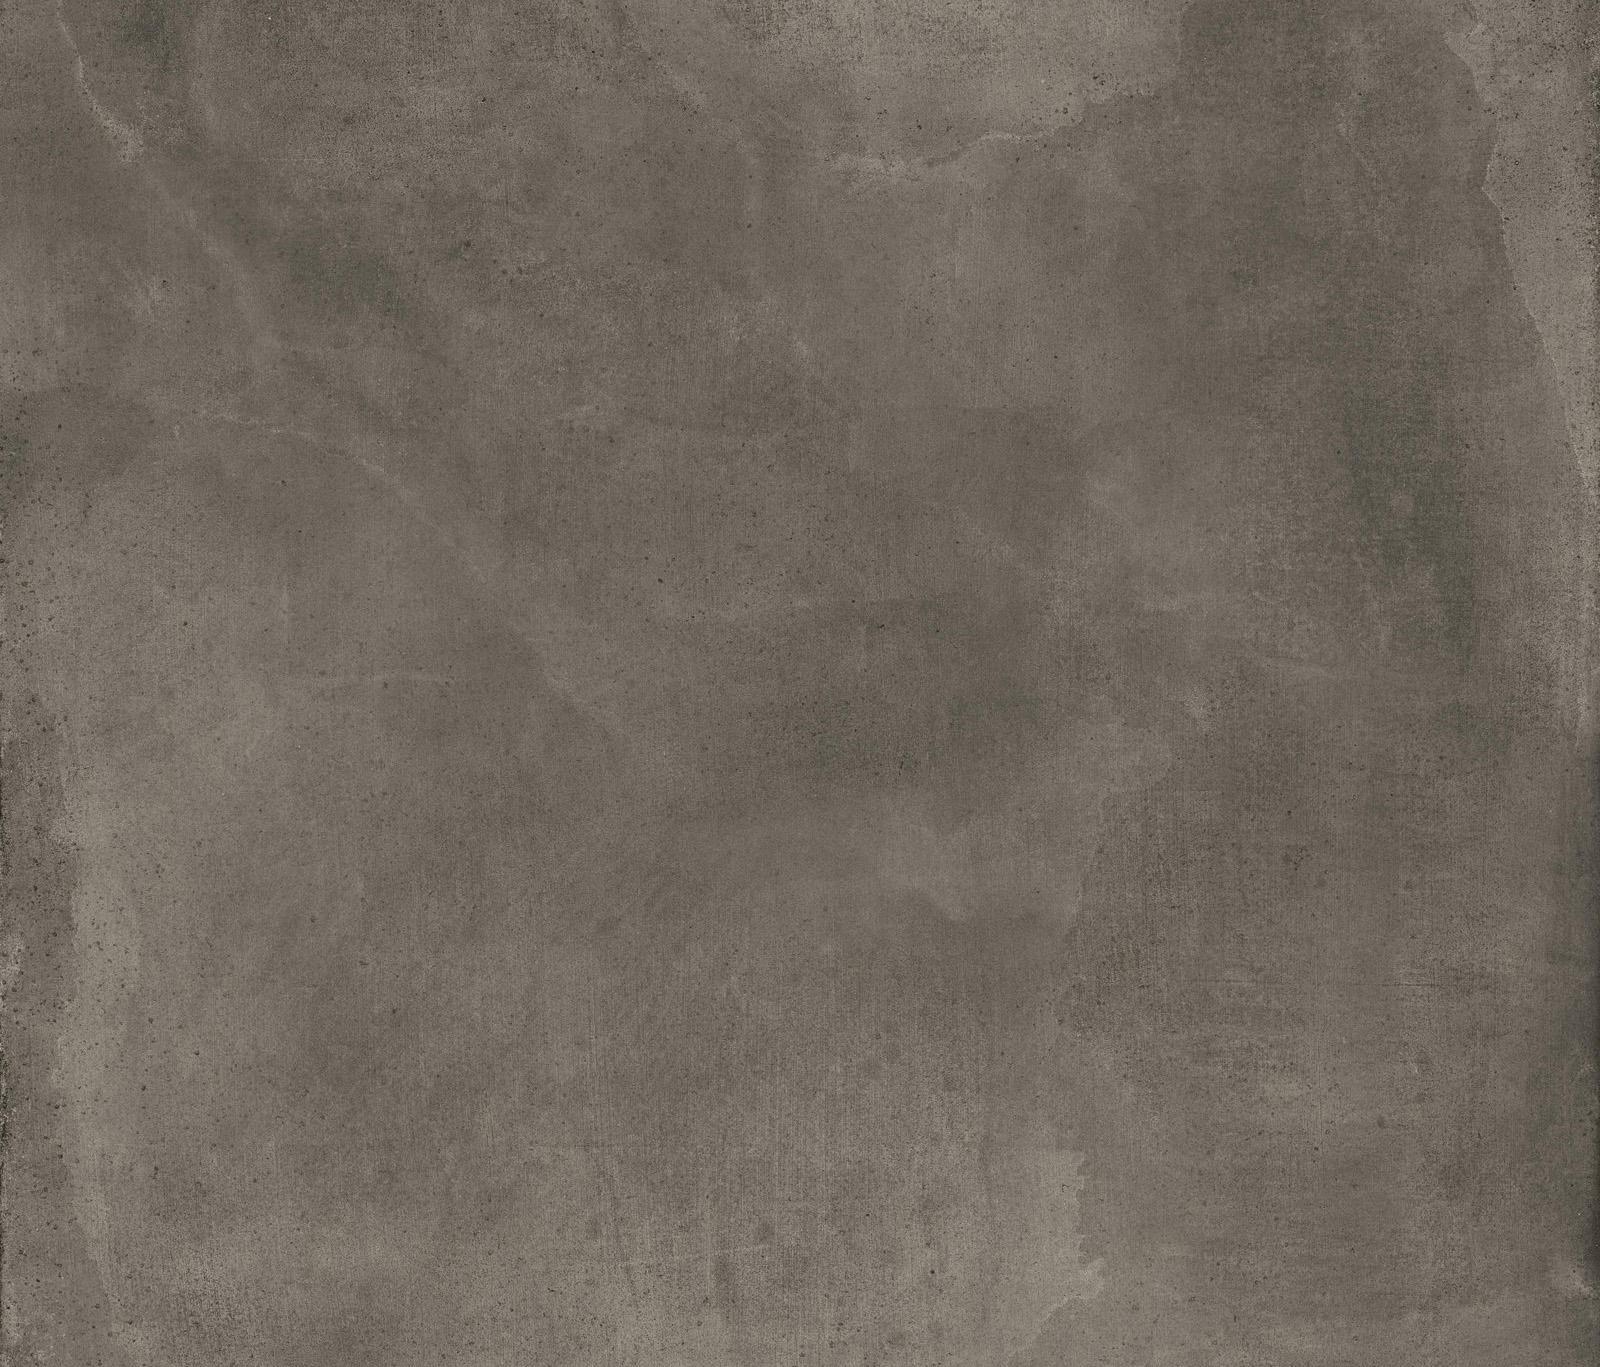 one ground carrelage pour sol de caesar architonic. Black Bedroom Furniture Sets. Home Design Ideas